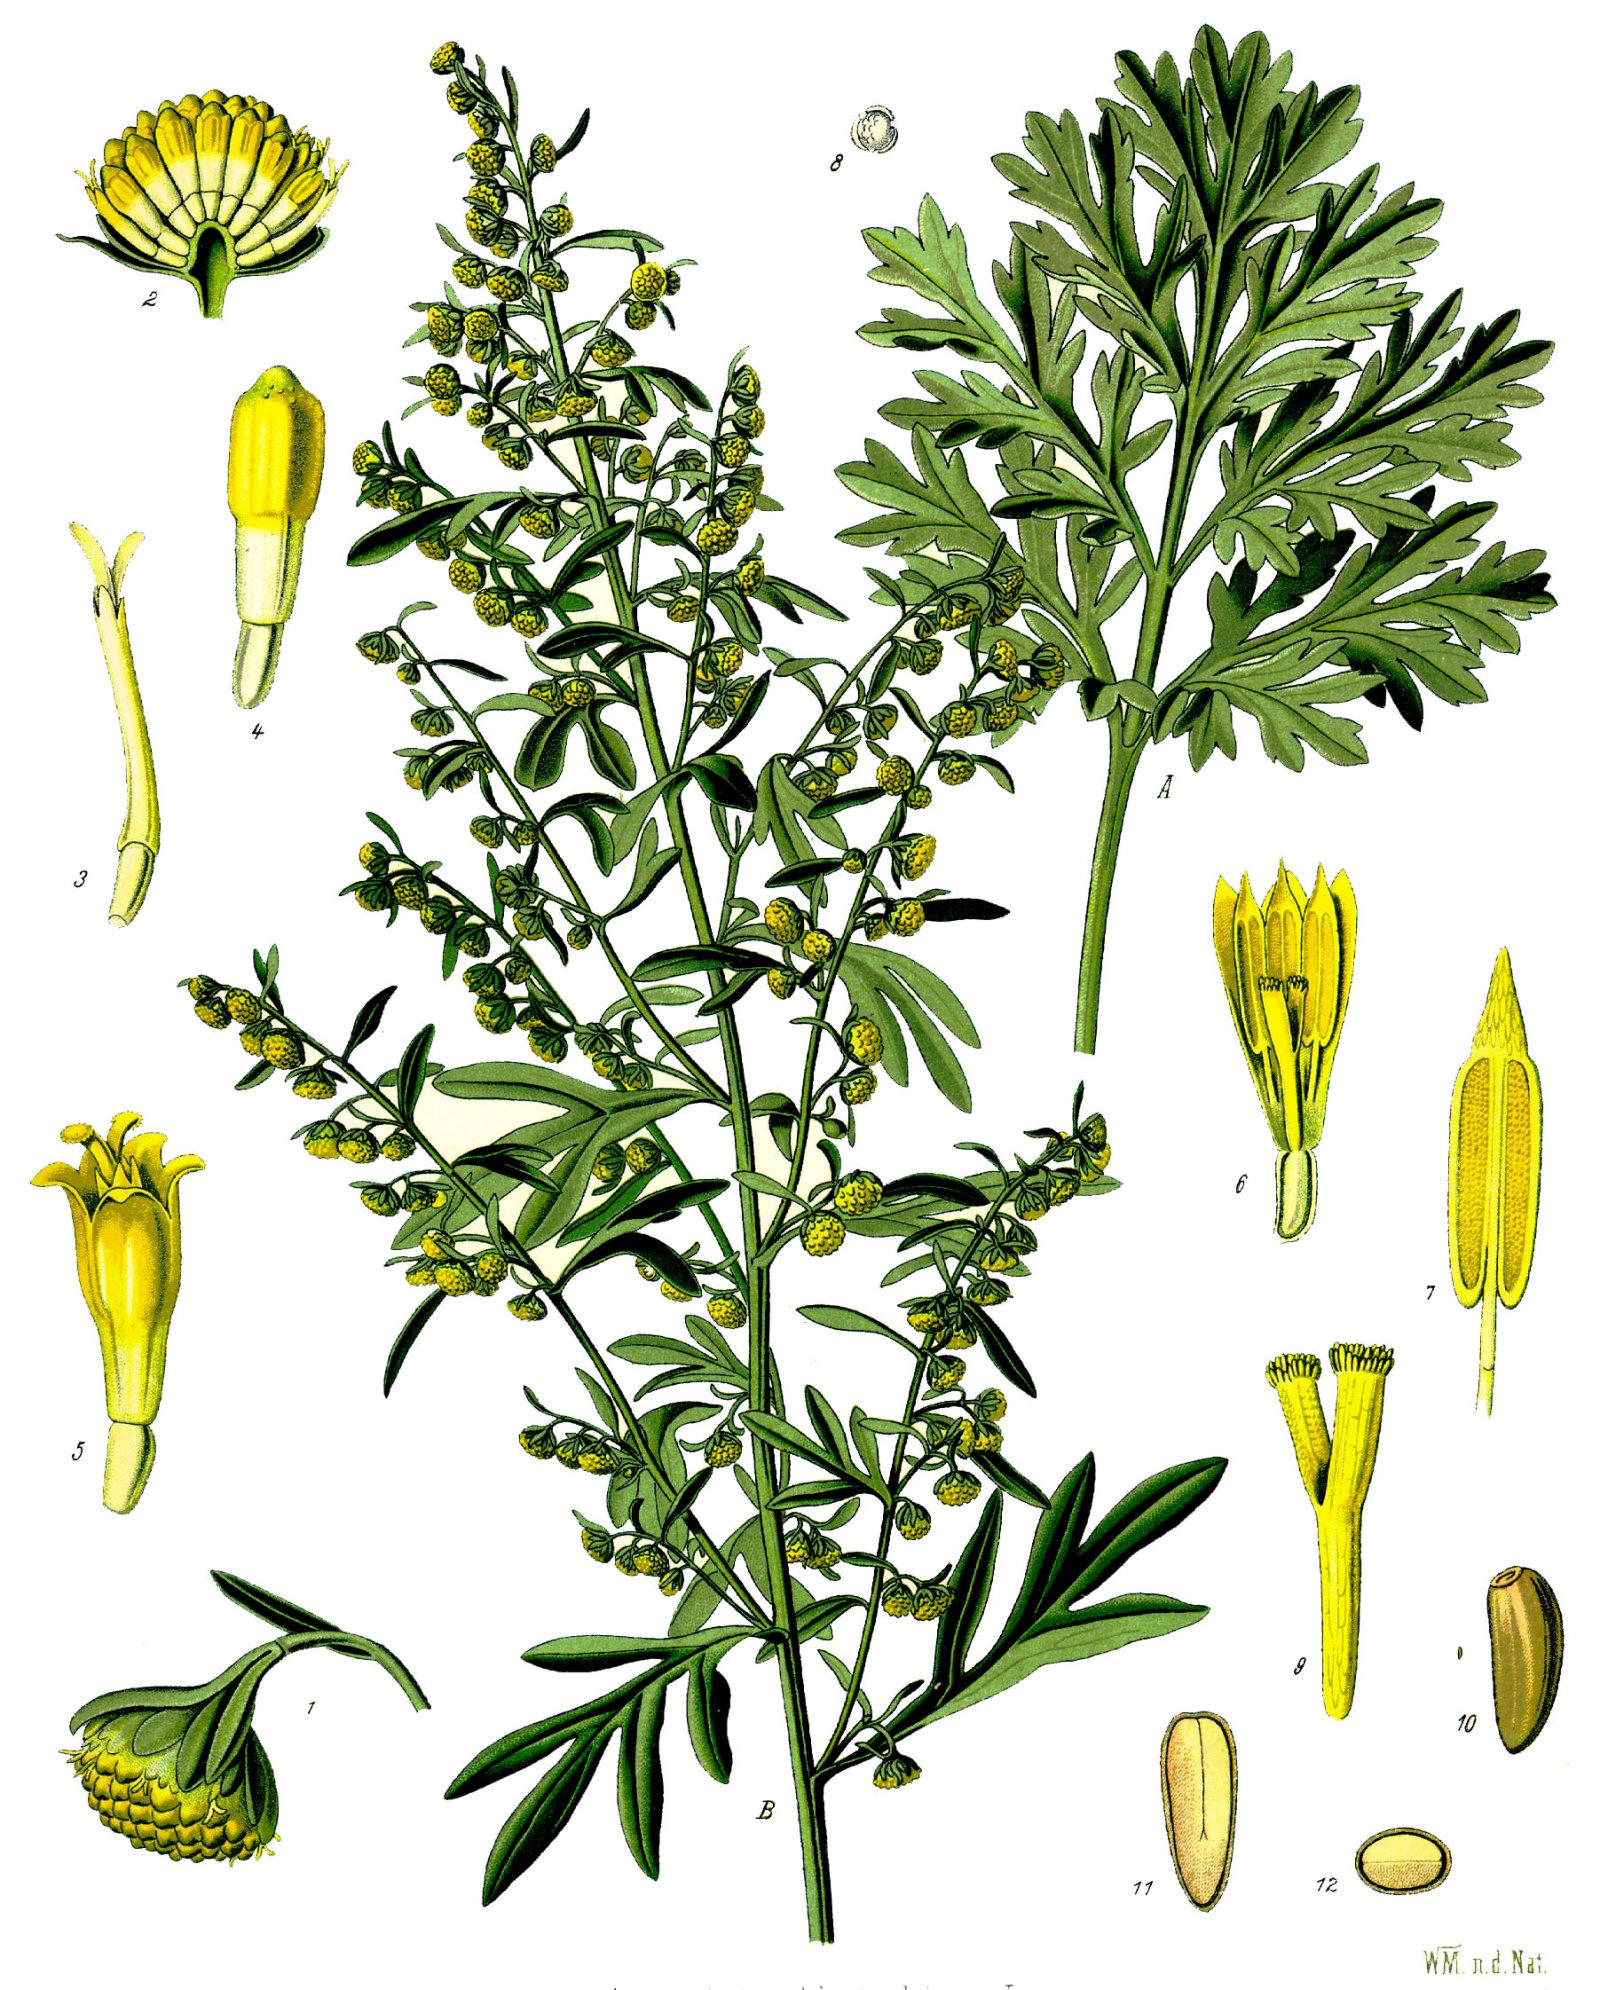 taimede valuga taimed